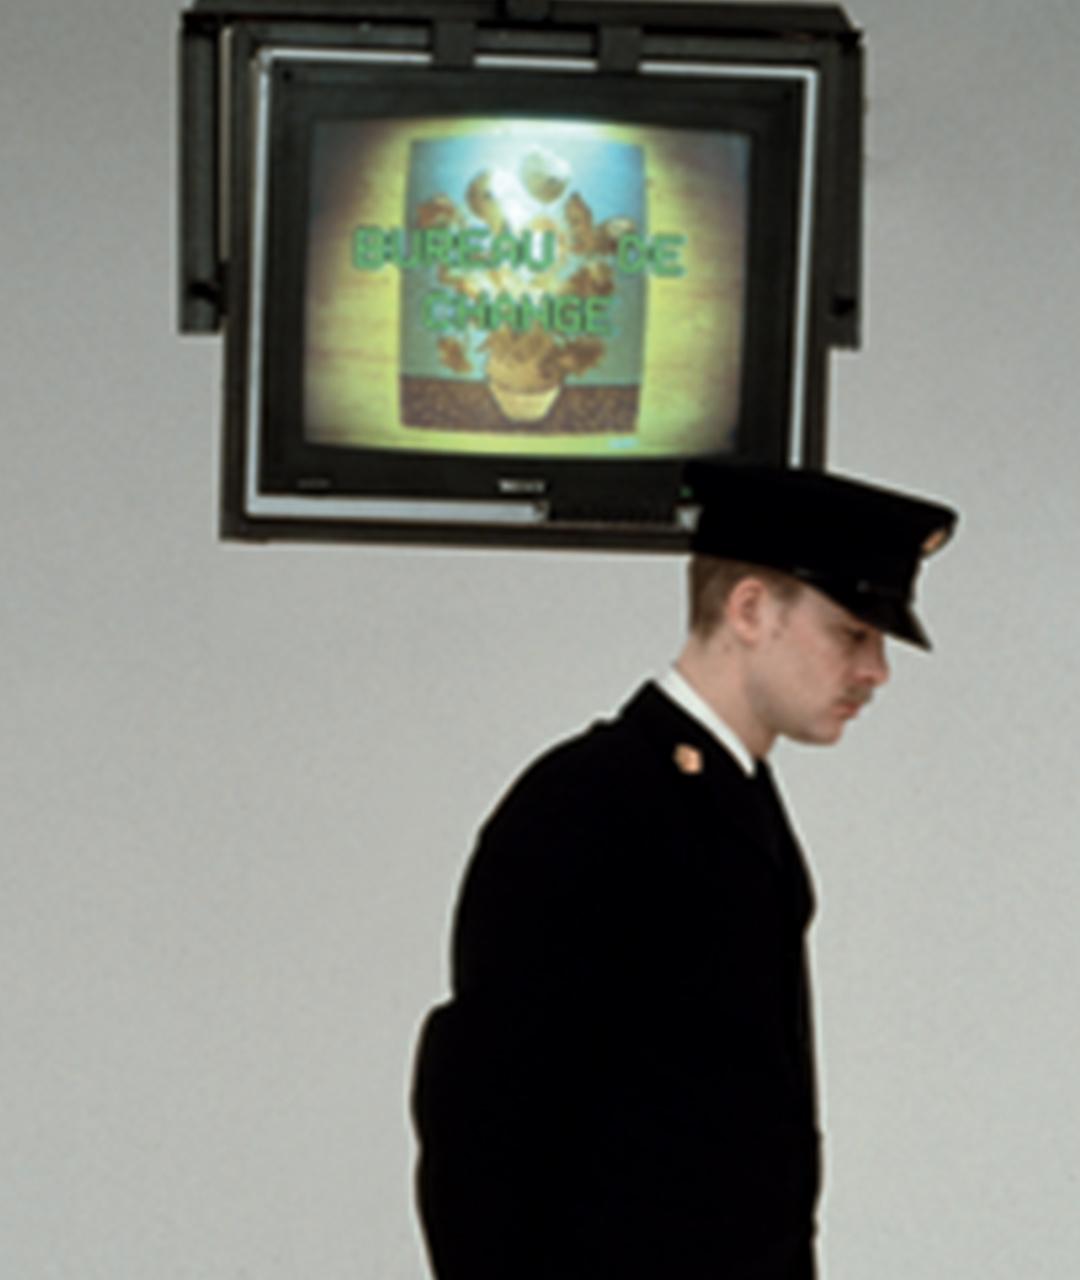 2.Bureau de change guard 2.jpg